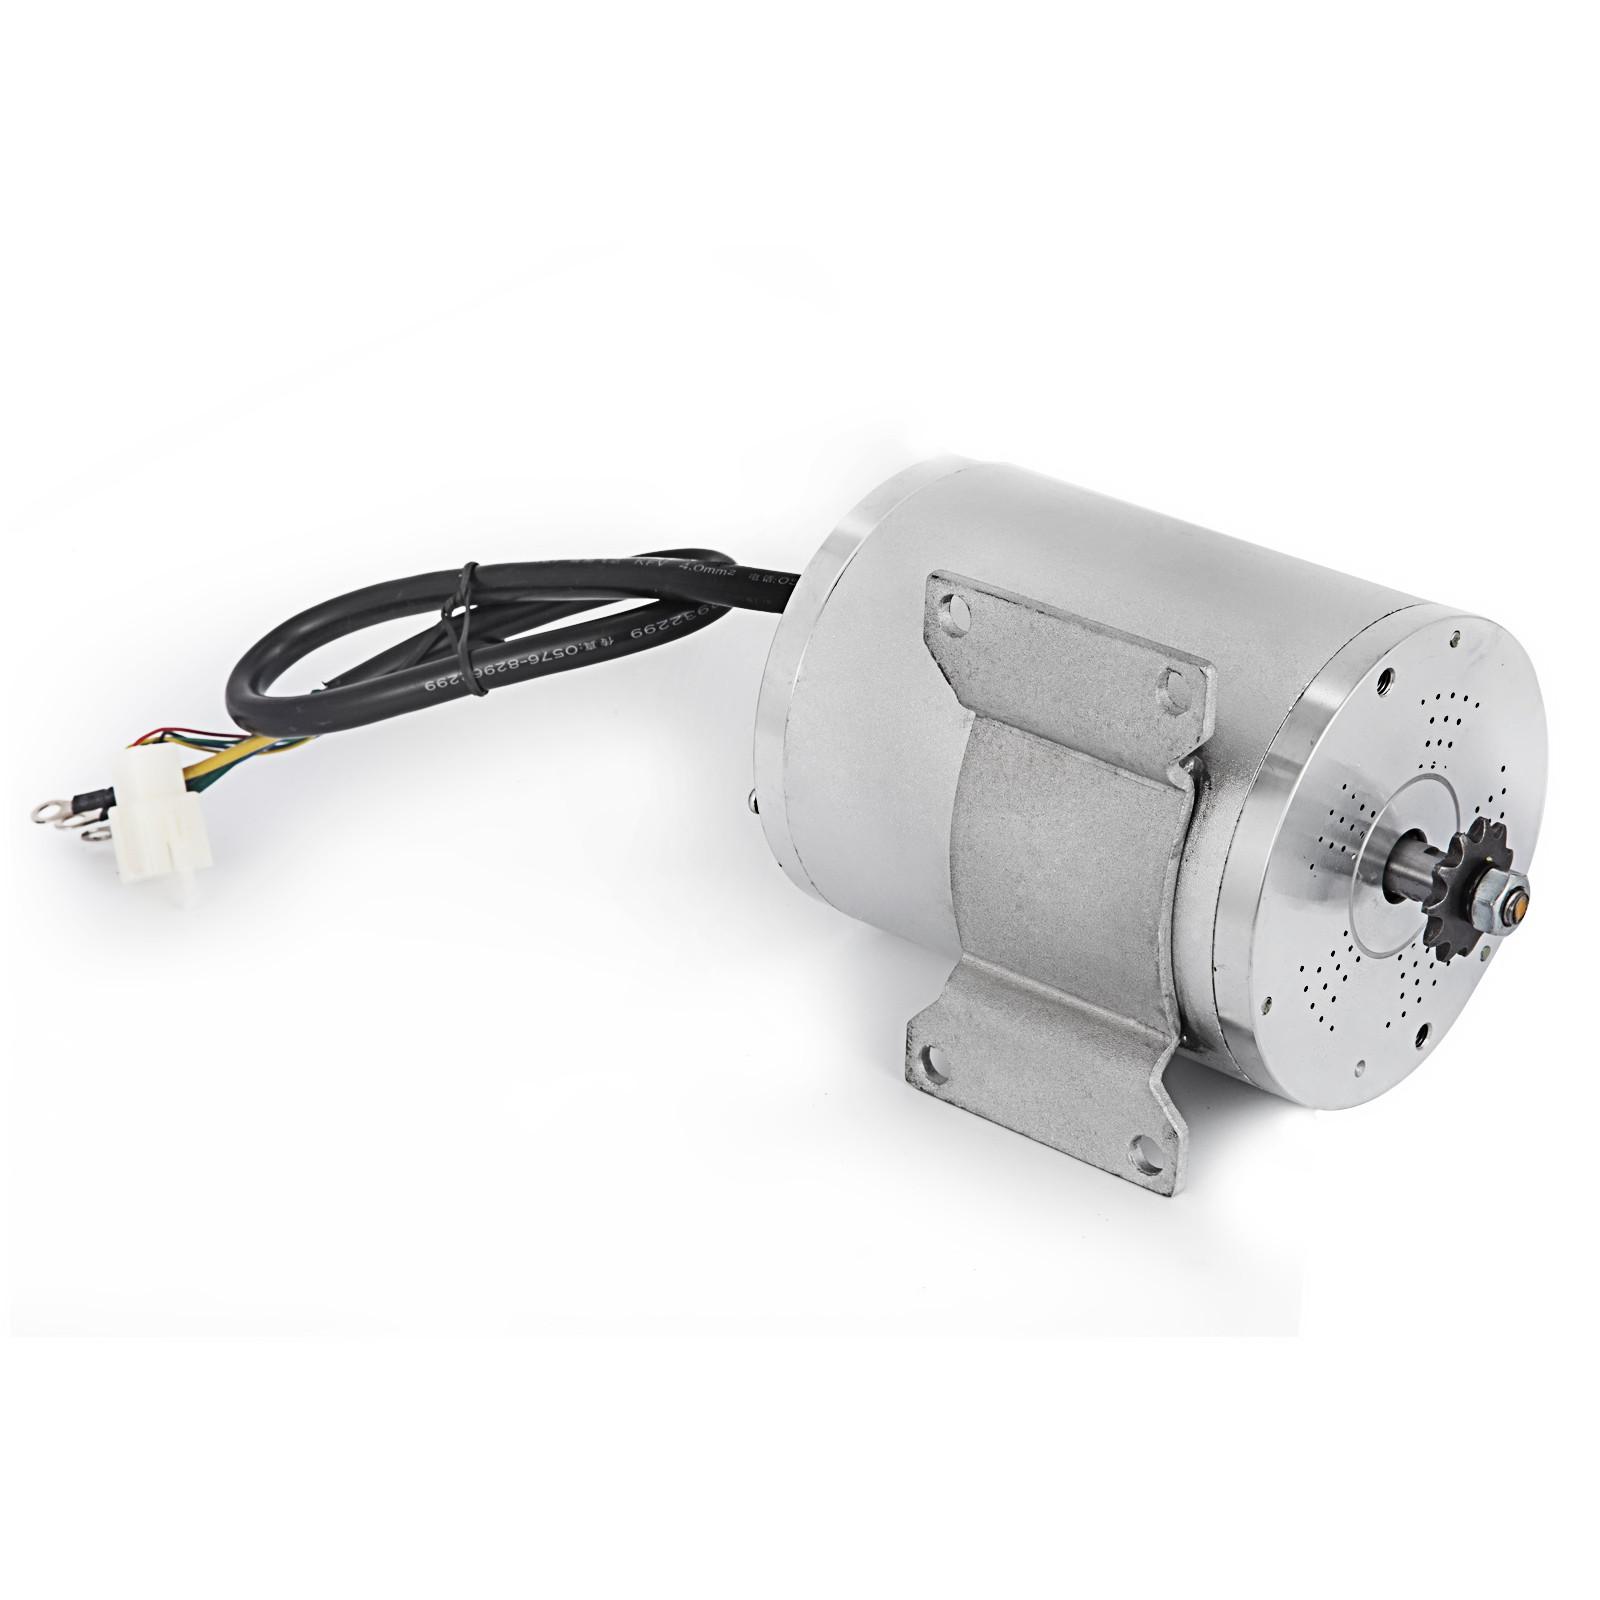 1800W-48V-DC-Brushless-Electric-Motor-Kit-f-Scooter-500-1800W-E-Bike-Go-Kart thumbnail 164